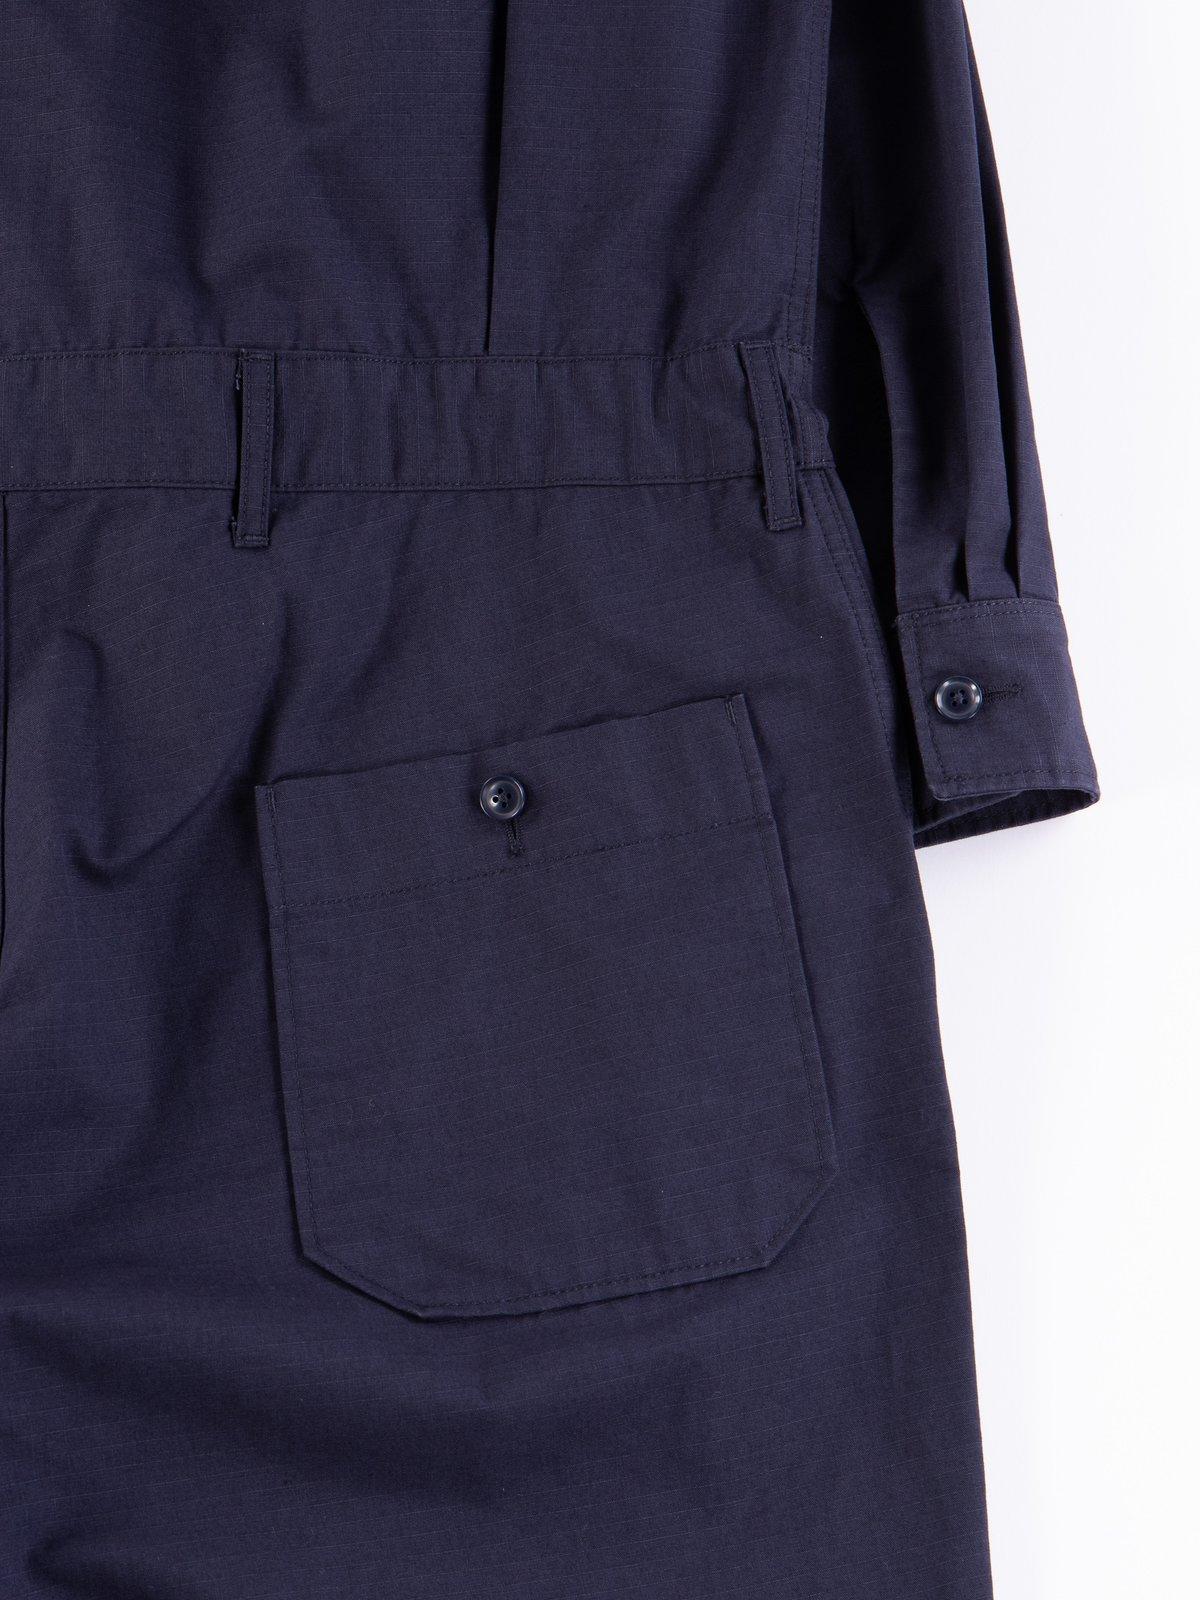 Dark Navy Cotton Ripstop Boiler Suit - Image 8